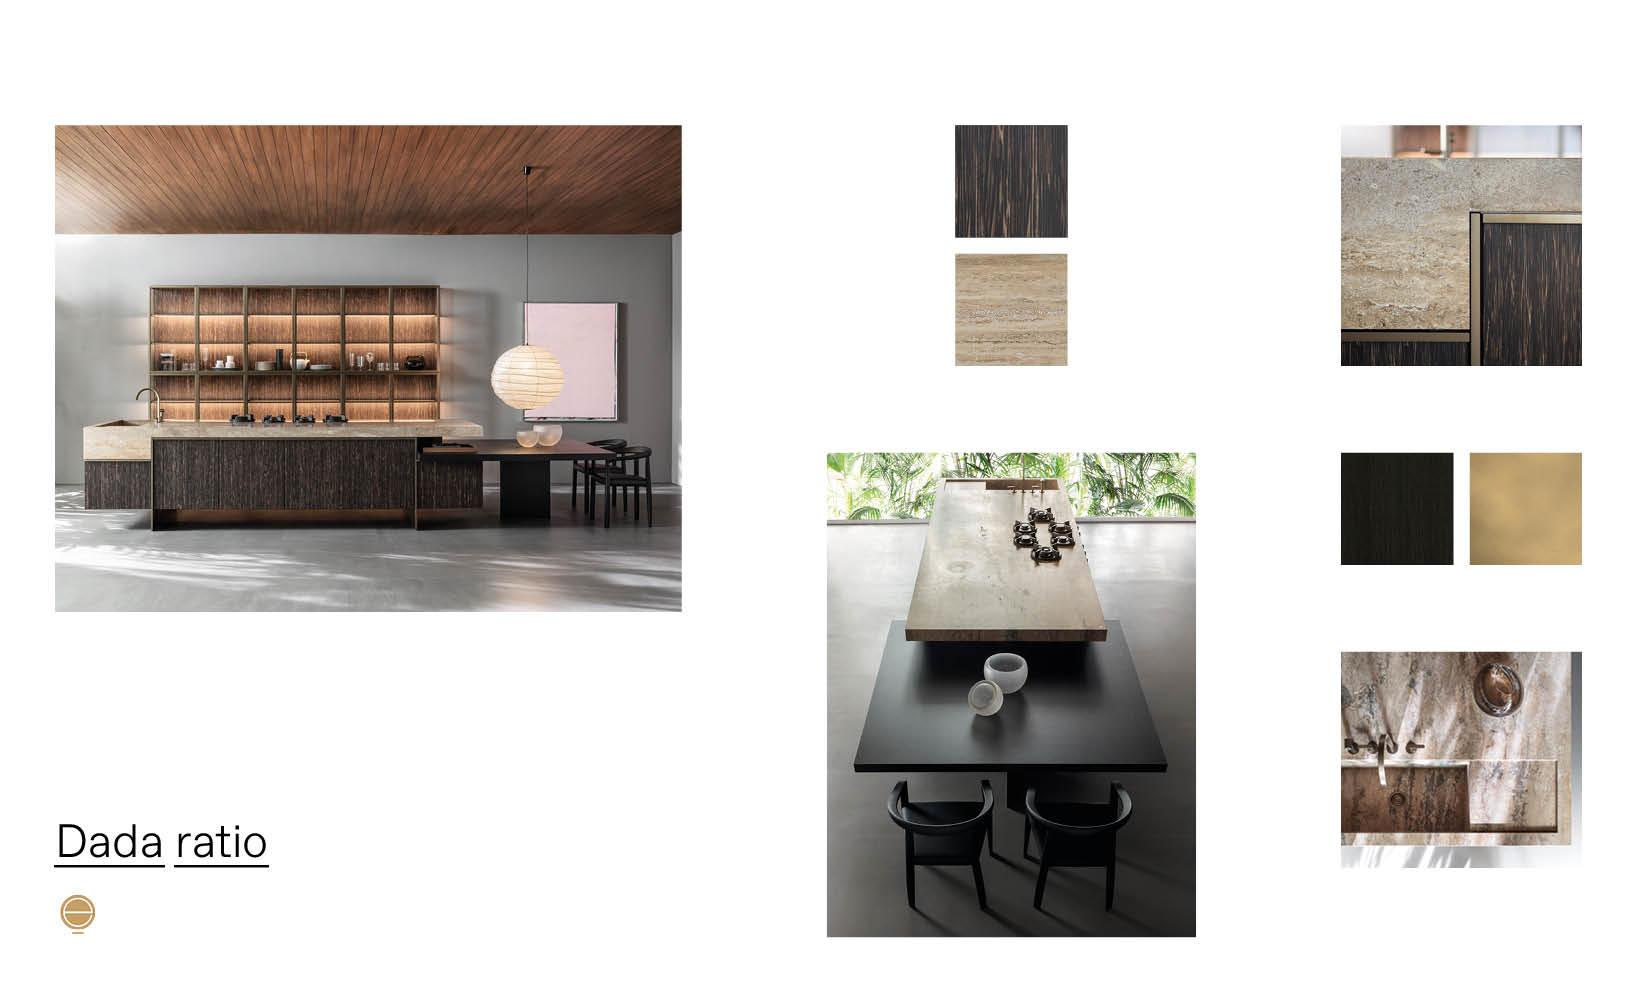 luxury Italian kitchens design and dada ratio product sheet made by Esperiri